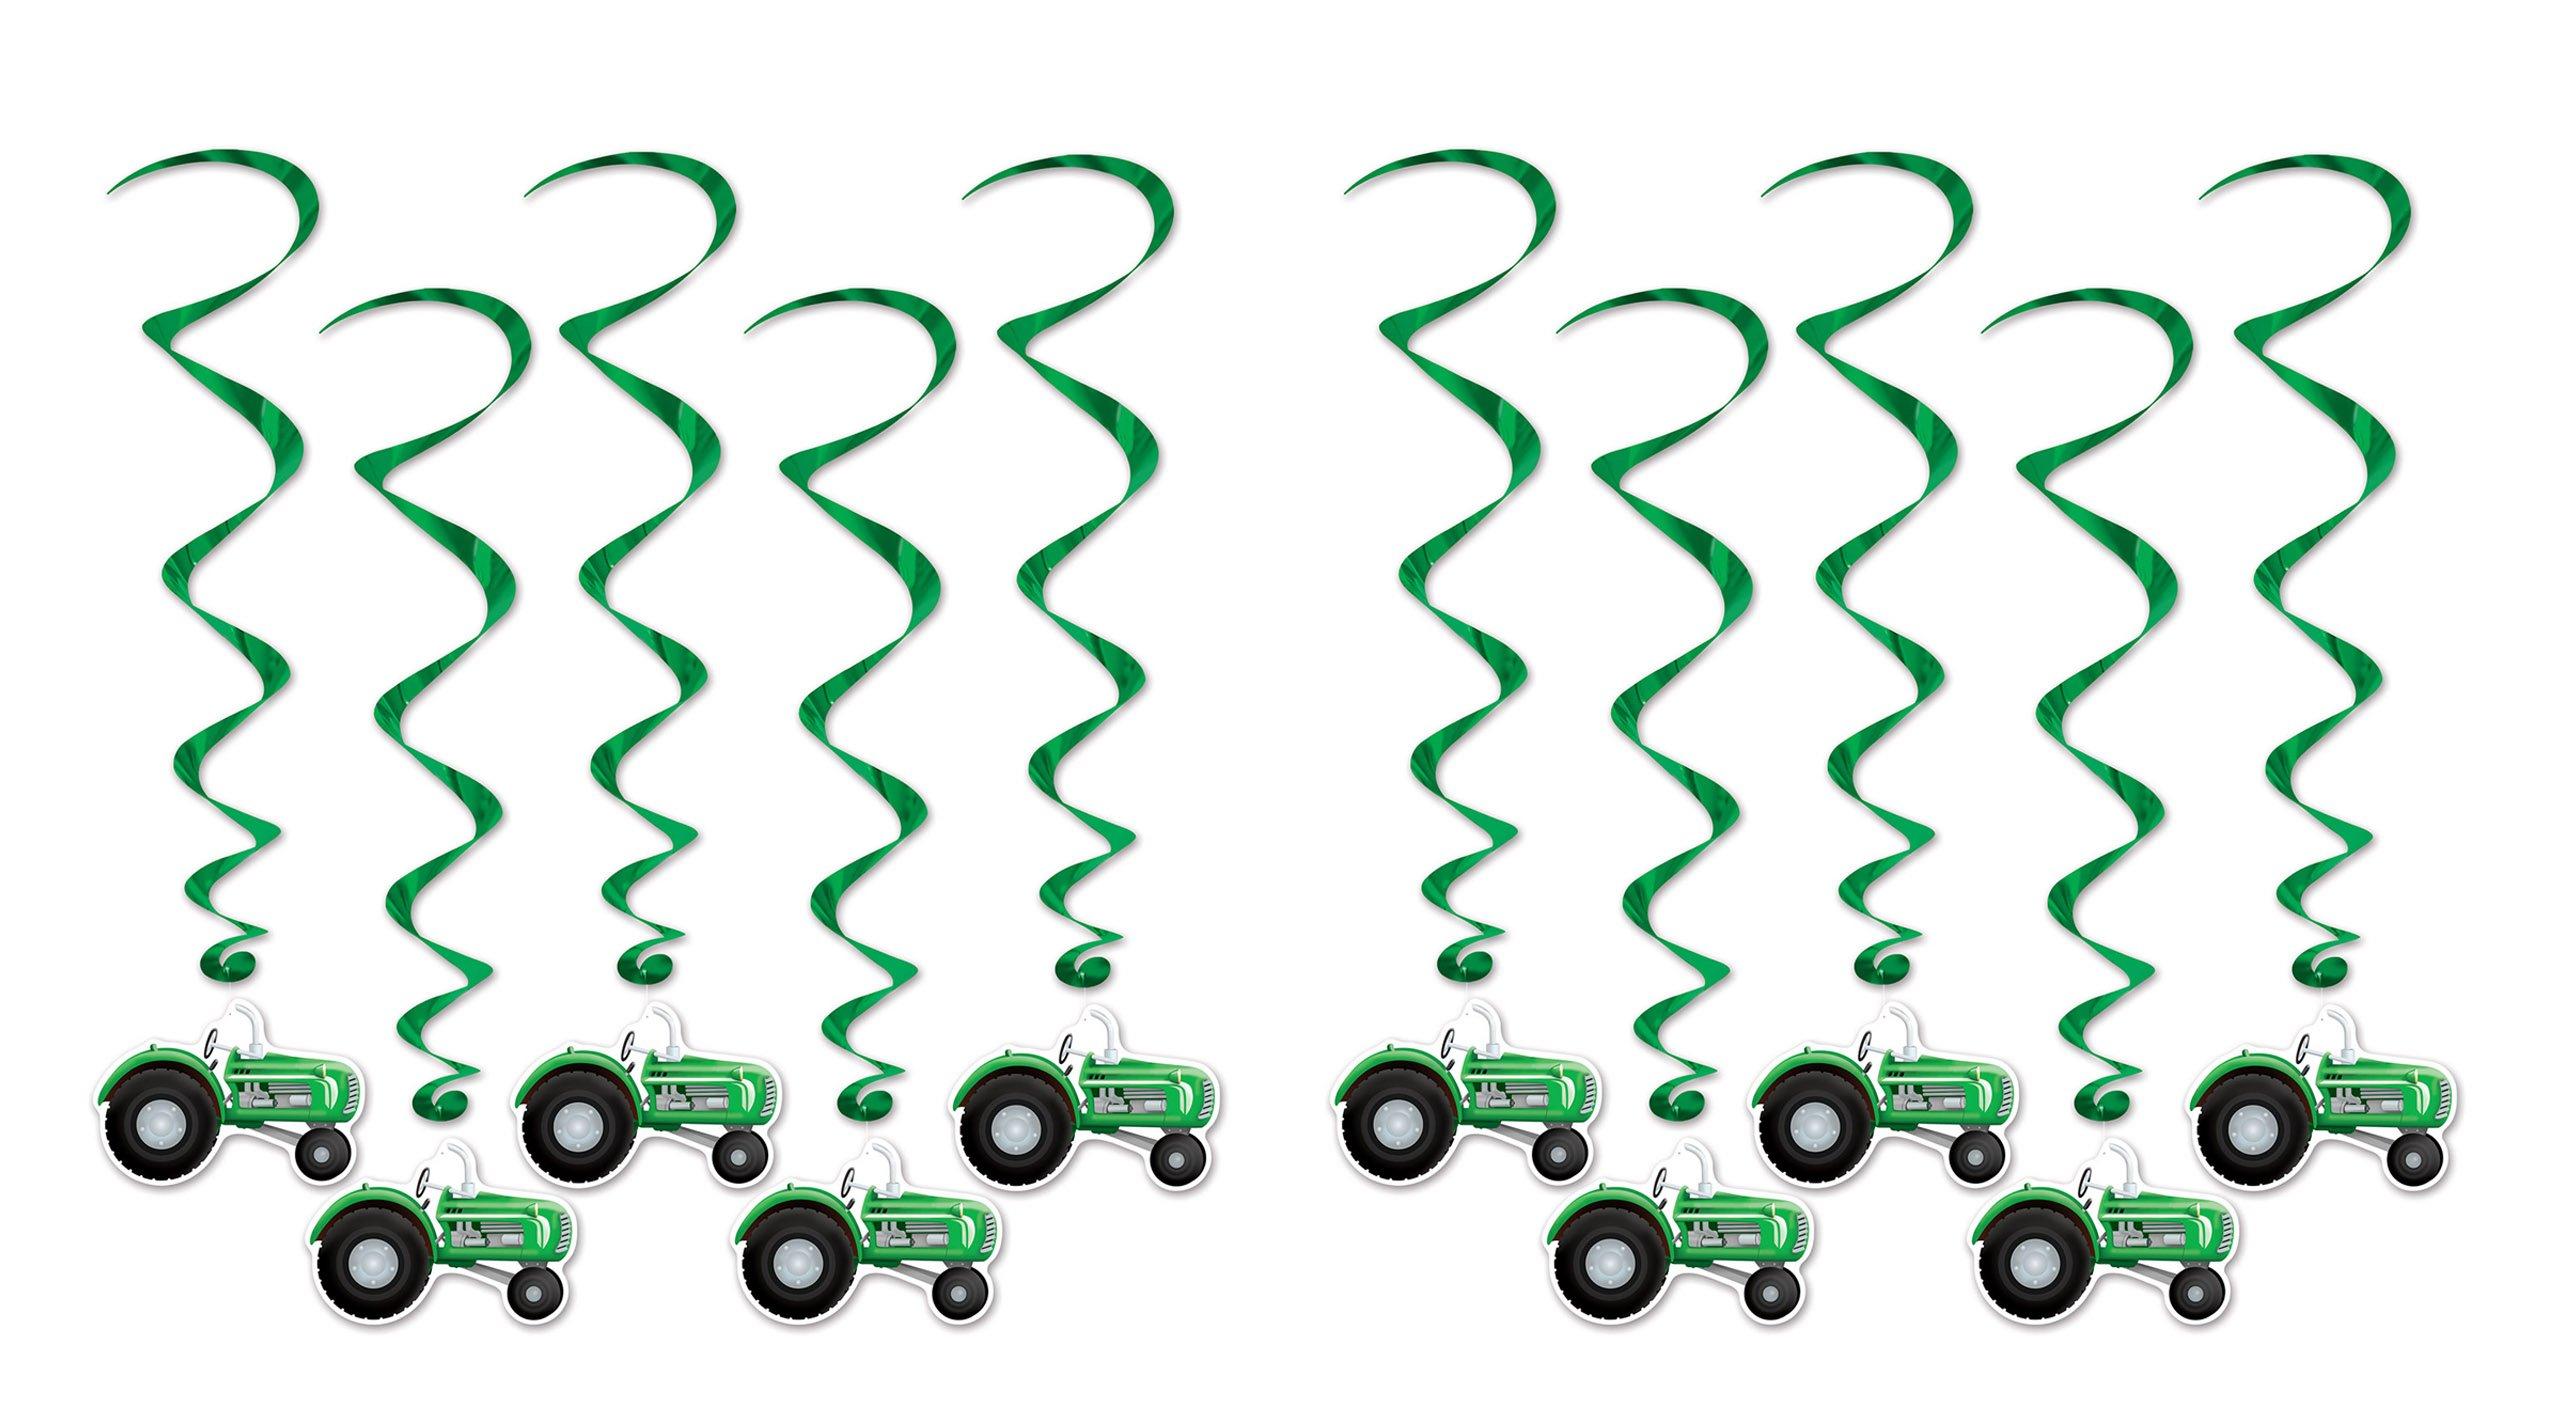 Beistle S57555AZ2 Tractor Whirls, Green/Black/White